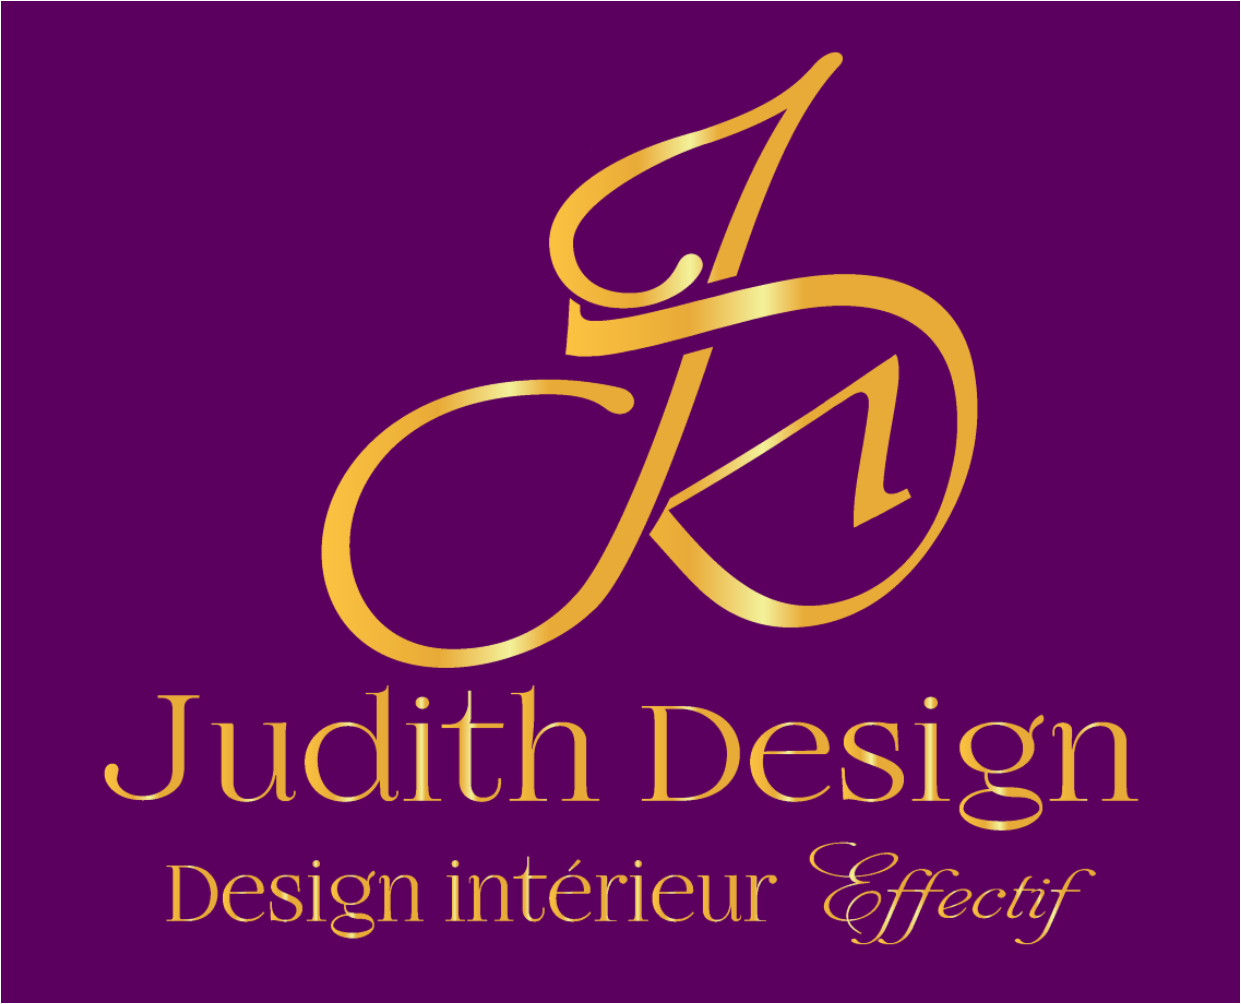 Judith Design